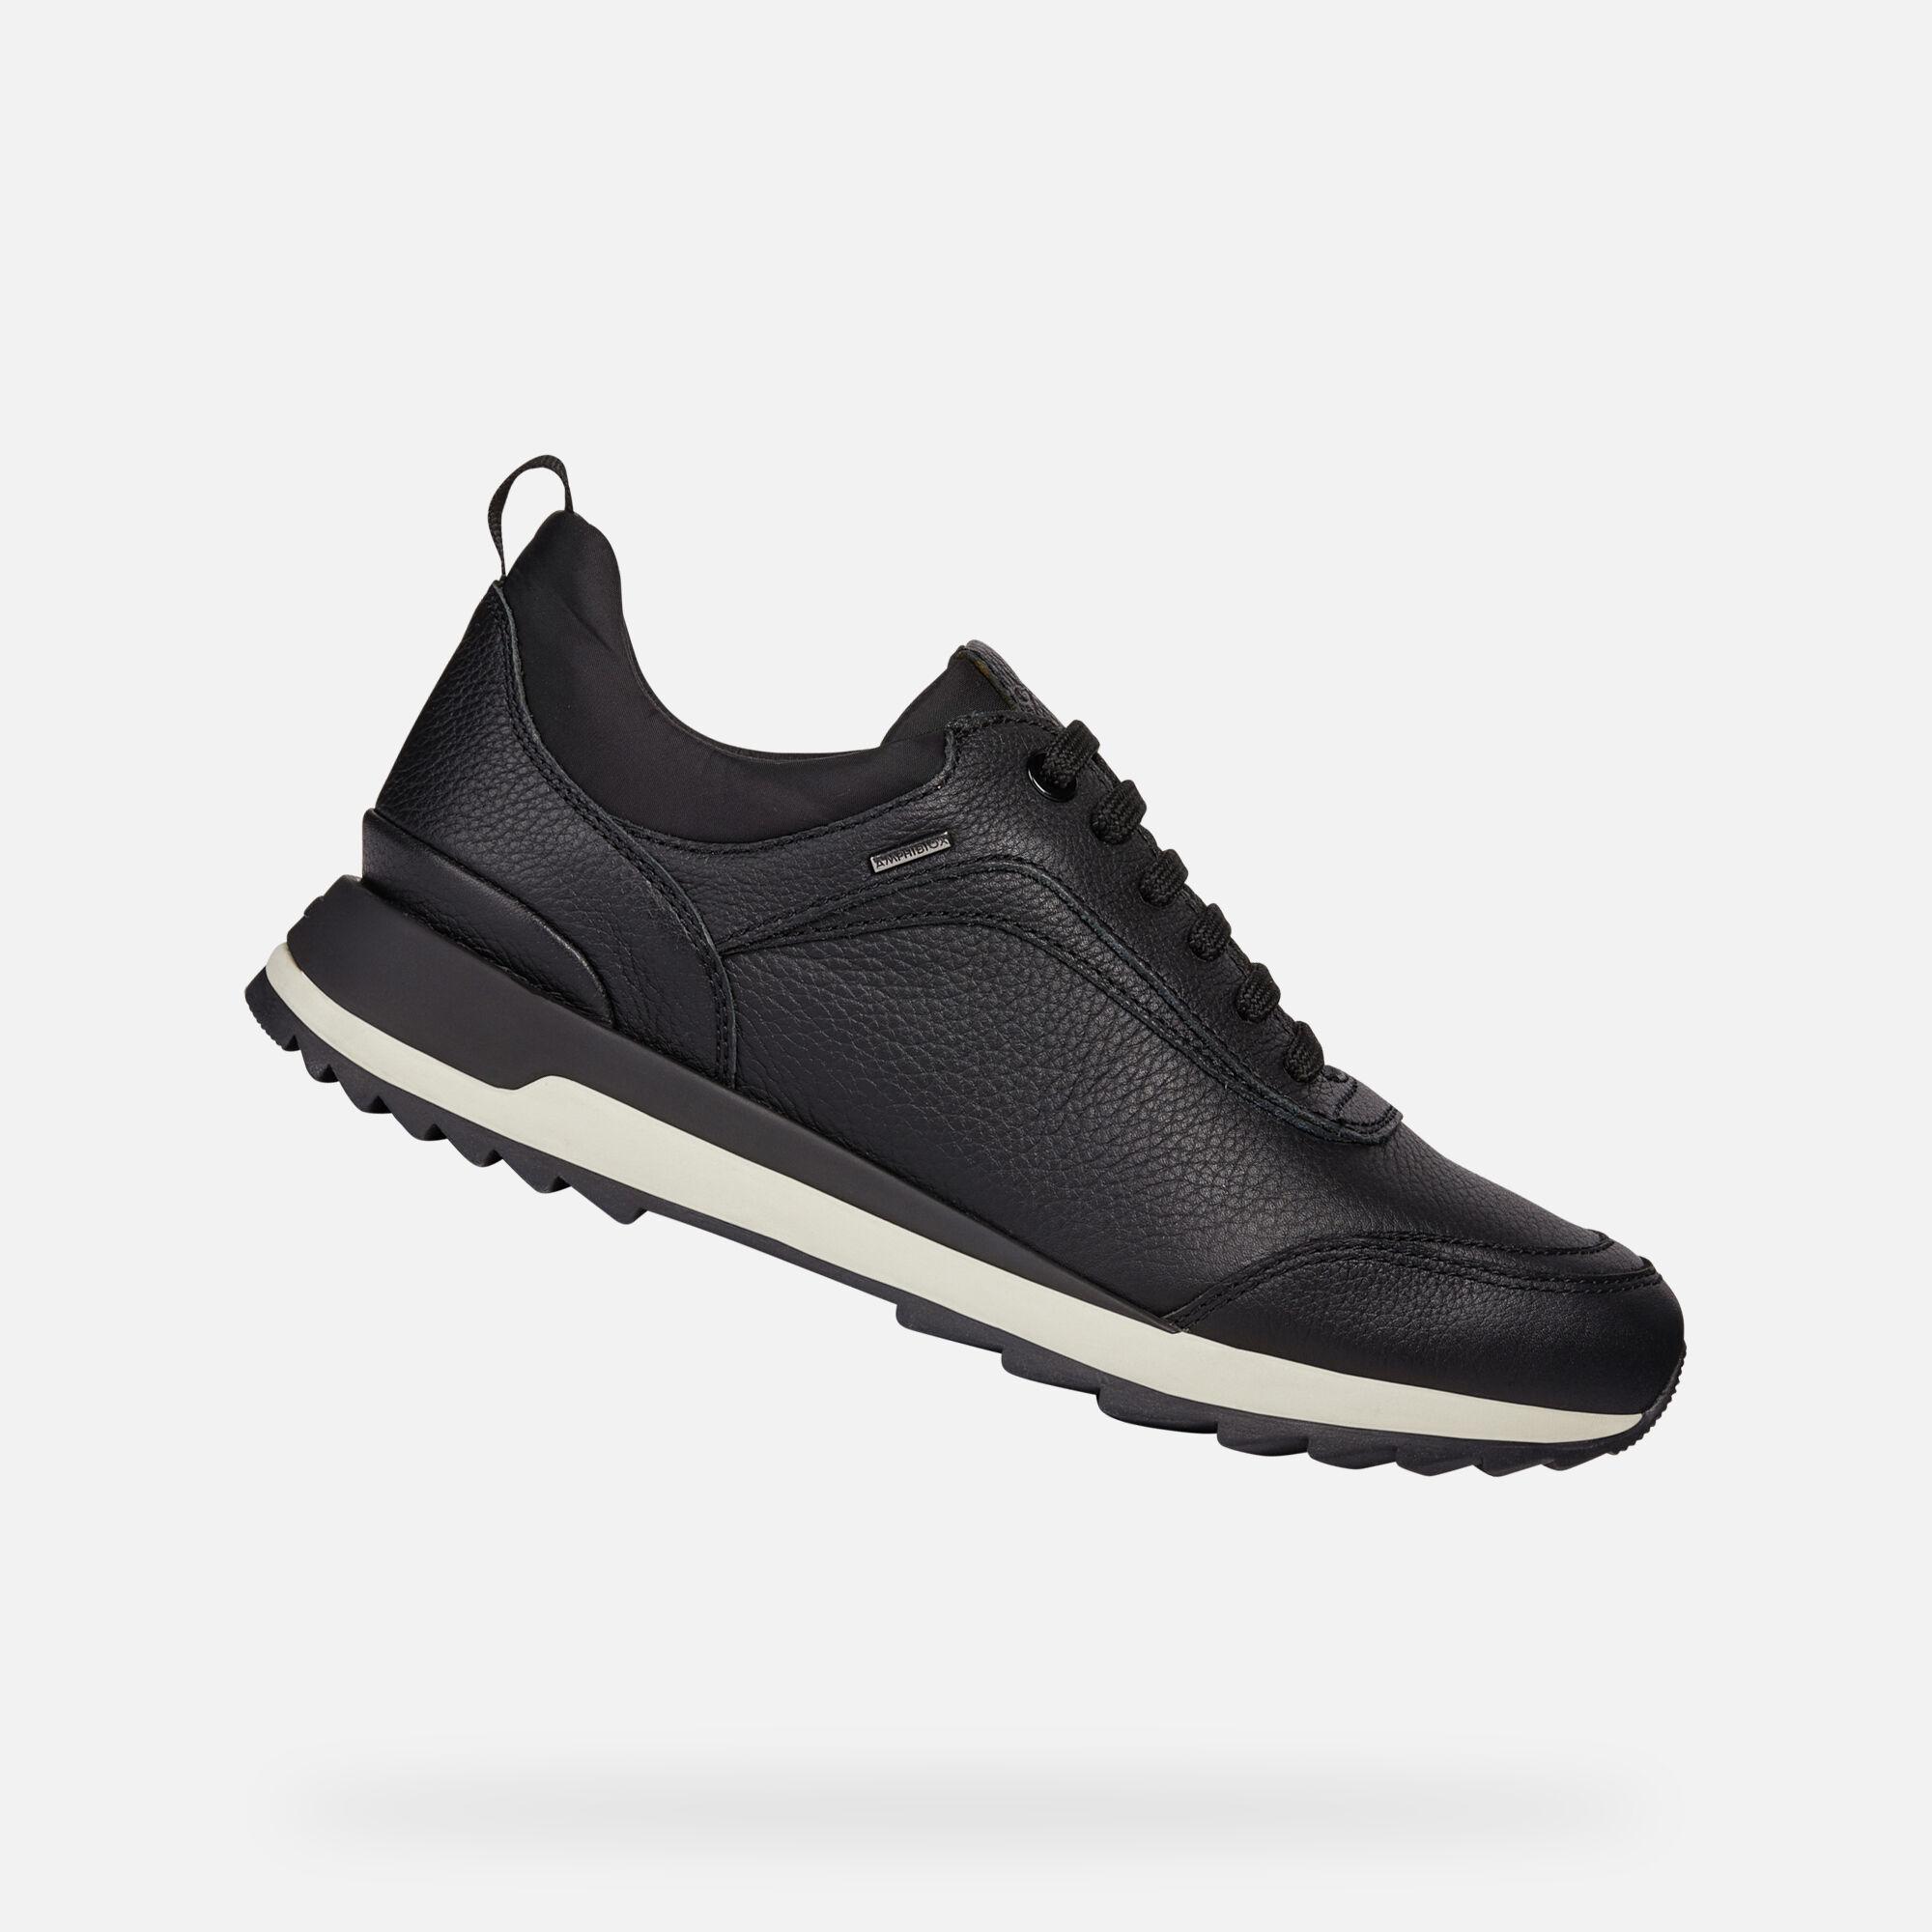 Geox Women's D ANEKO B ABX Black Shoes | Geox Fall Winter